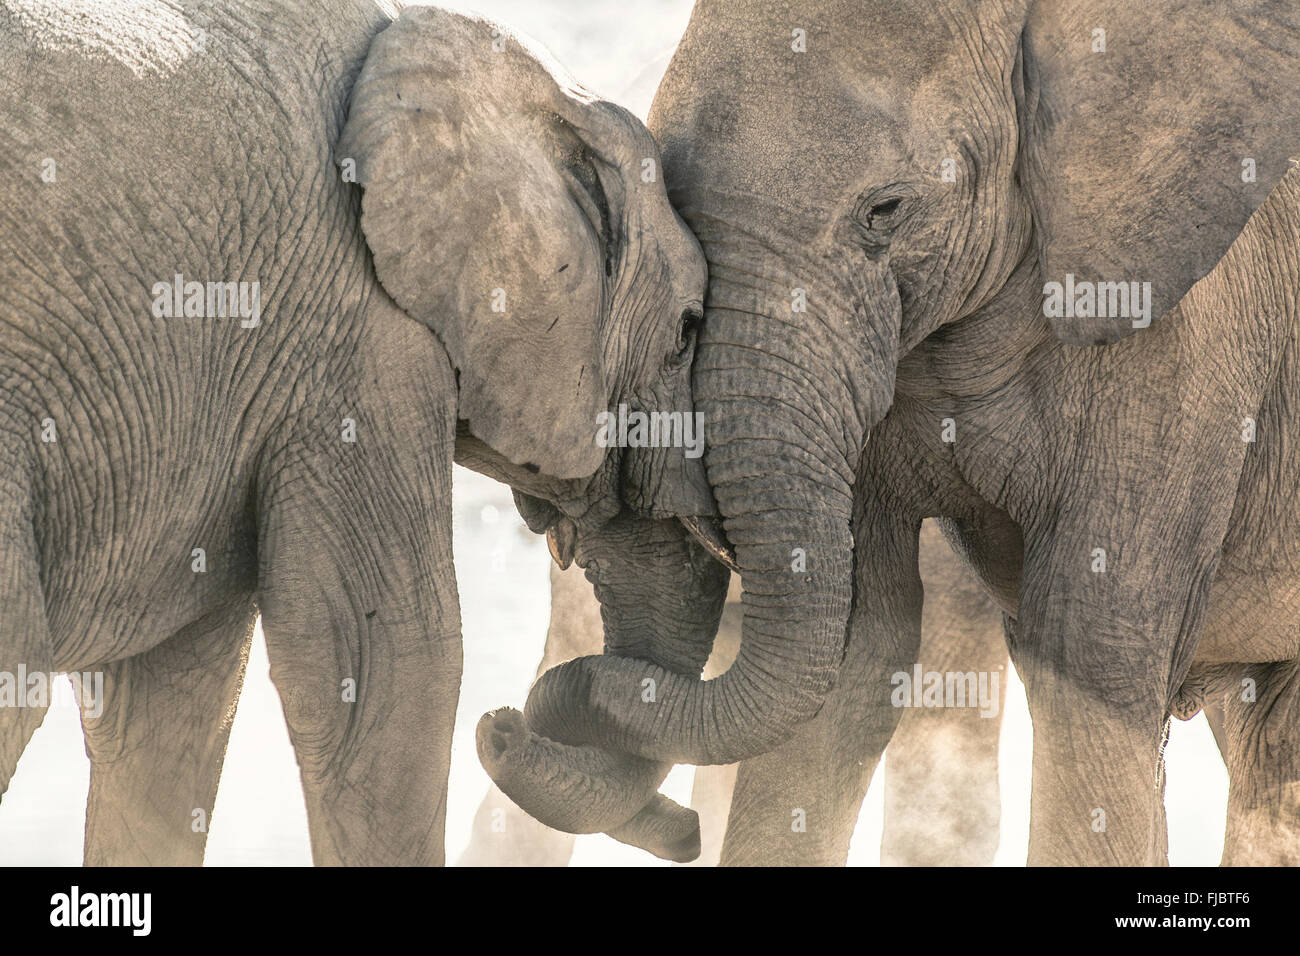 Zwei Elefanten Gerangel Stockbild